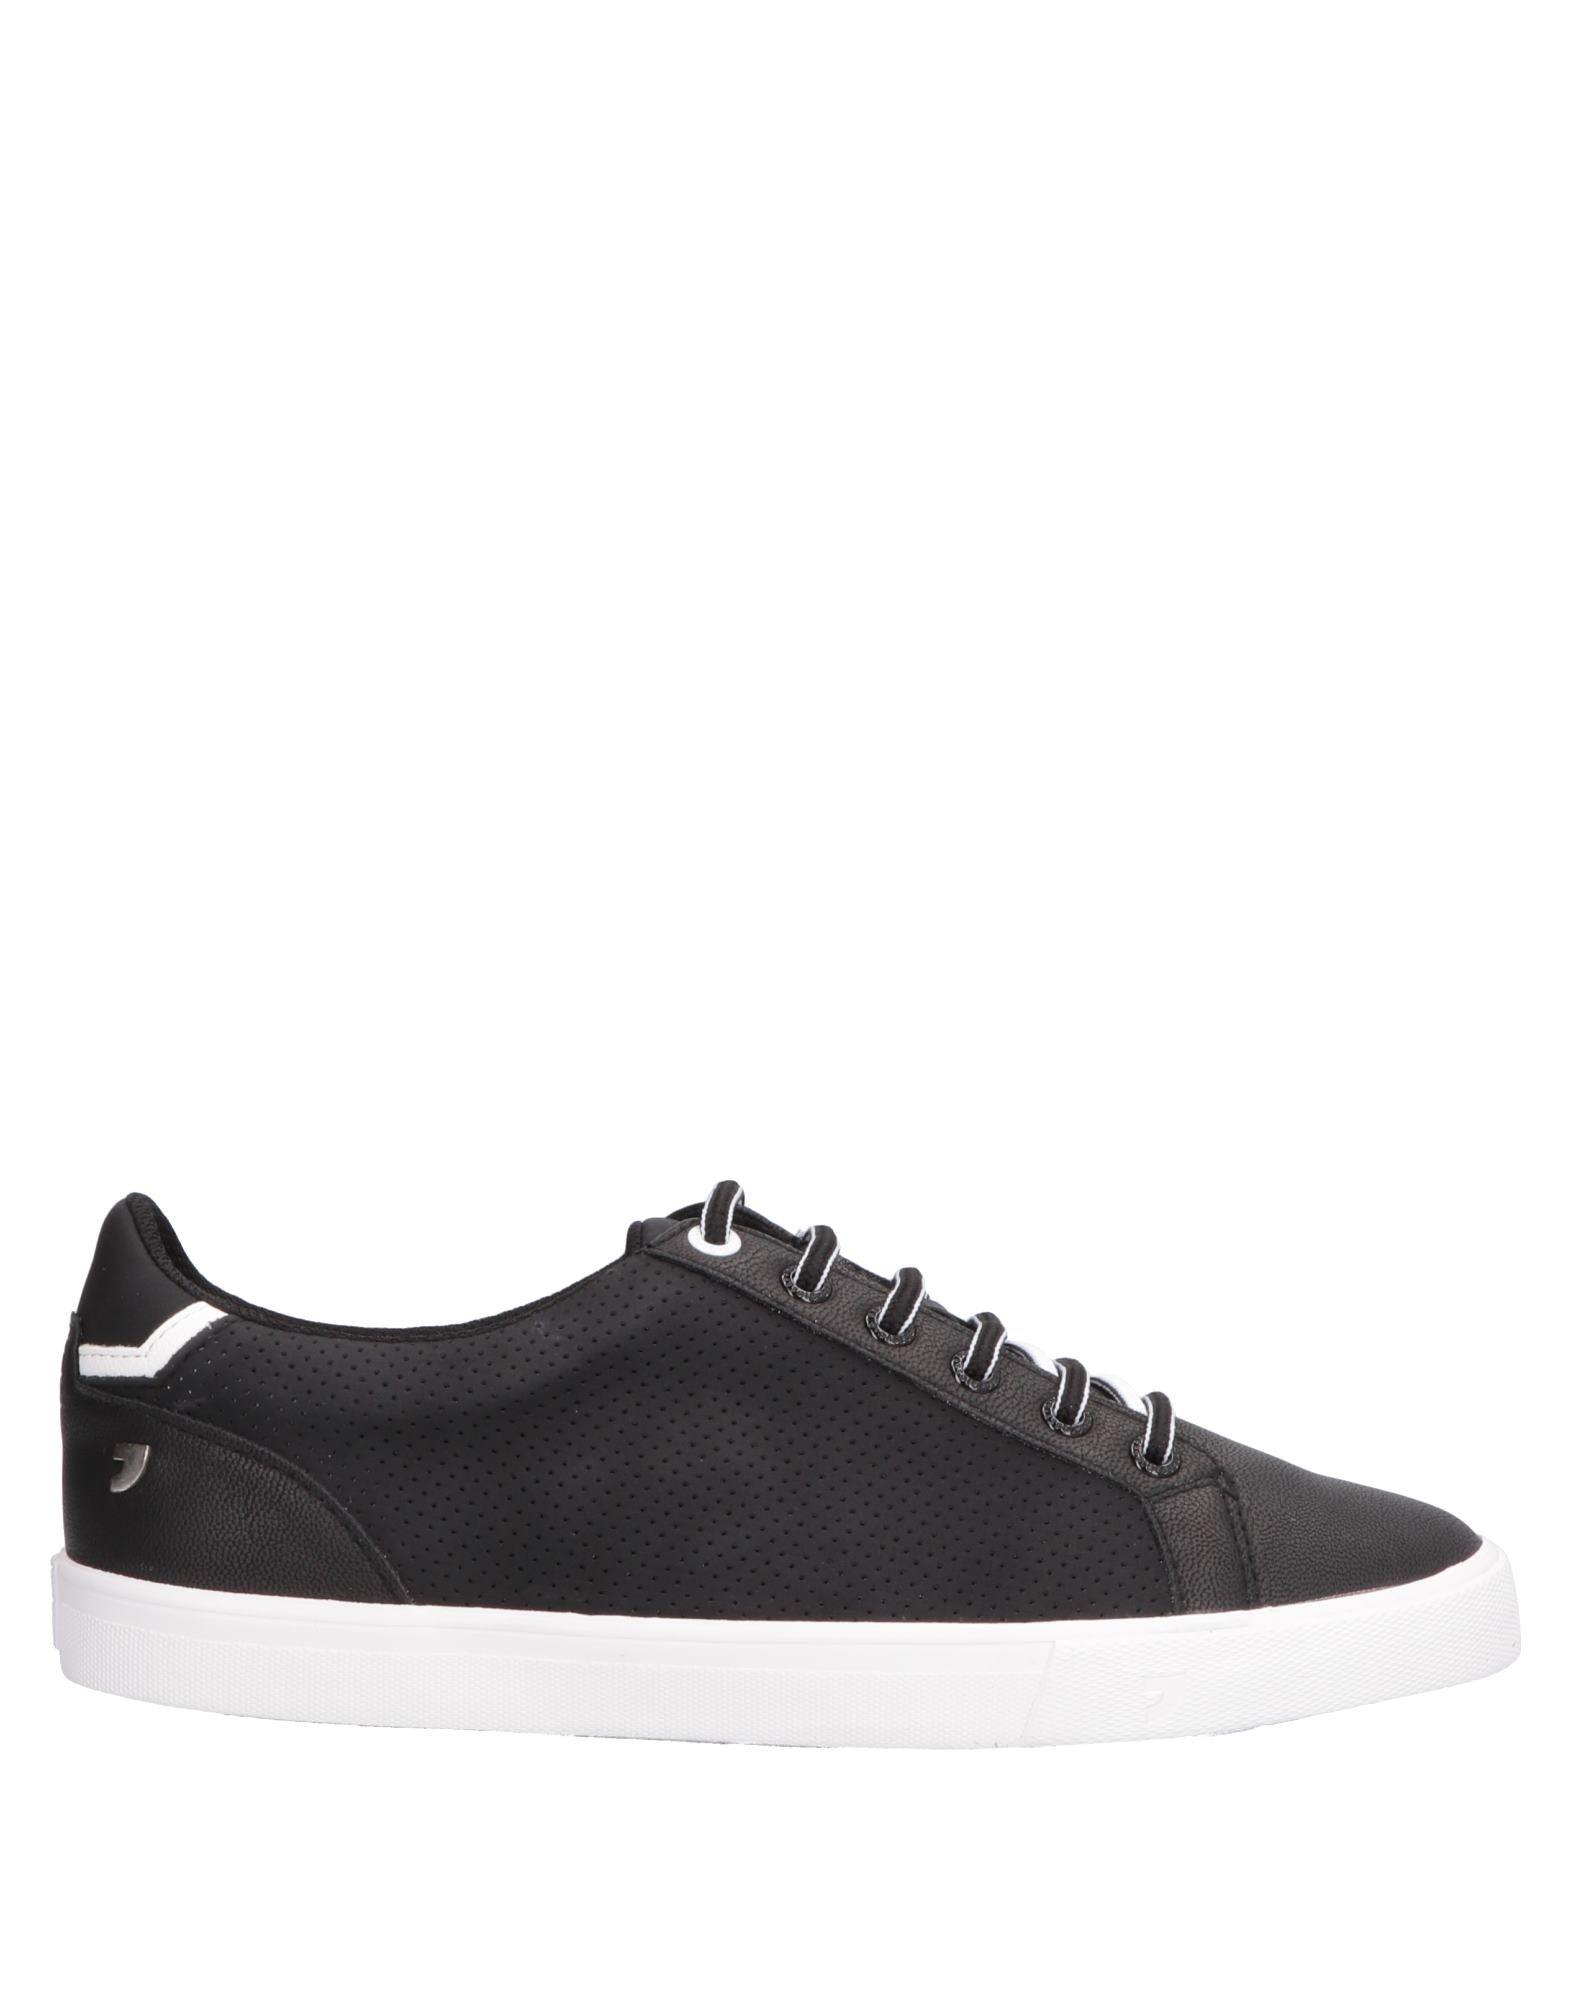 Gioseppo Sneakers - on Men Gioseppo Sneakers online on -  United Kingdom - 11574656FJ 44099a